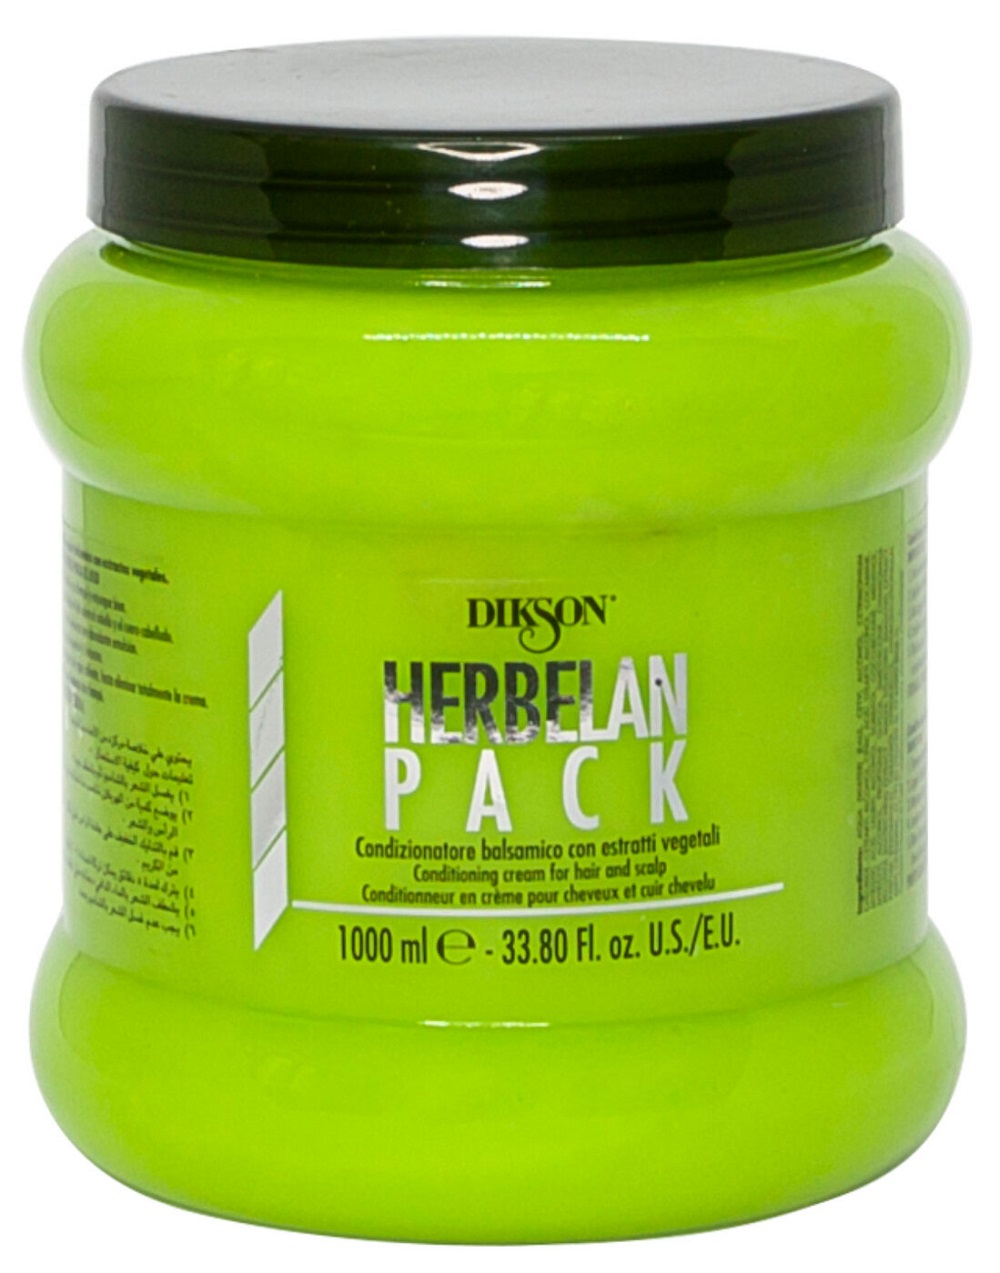 Herbelan Pack от Dikson